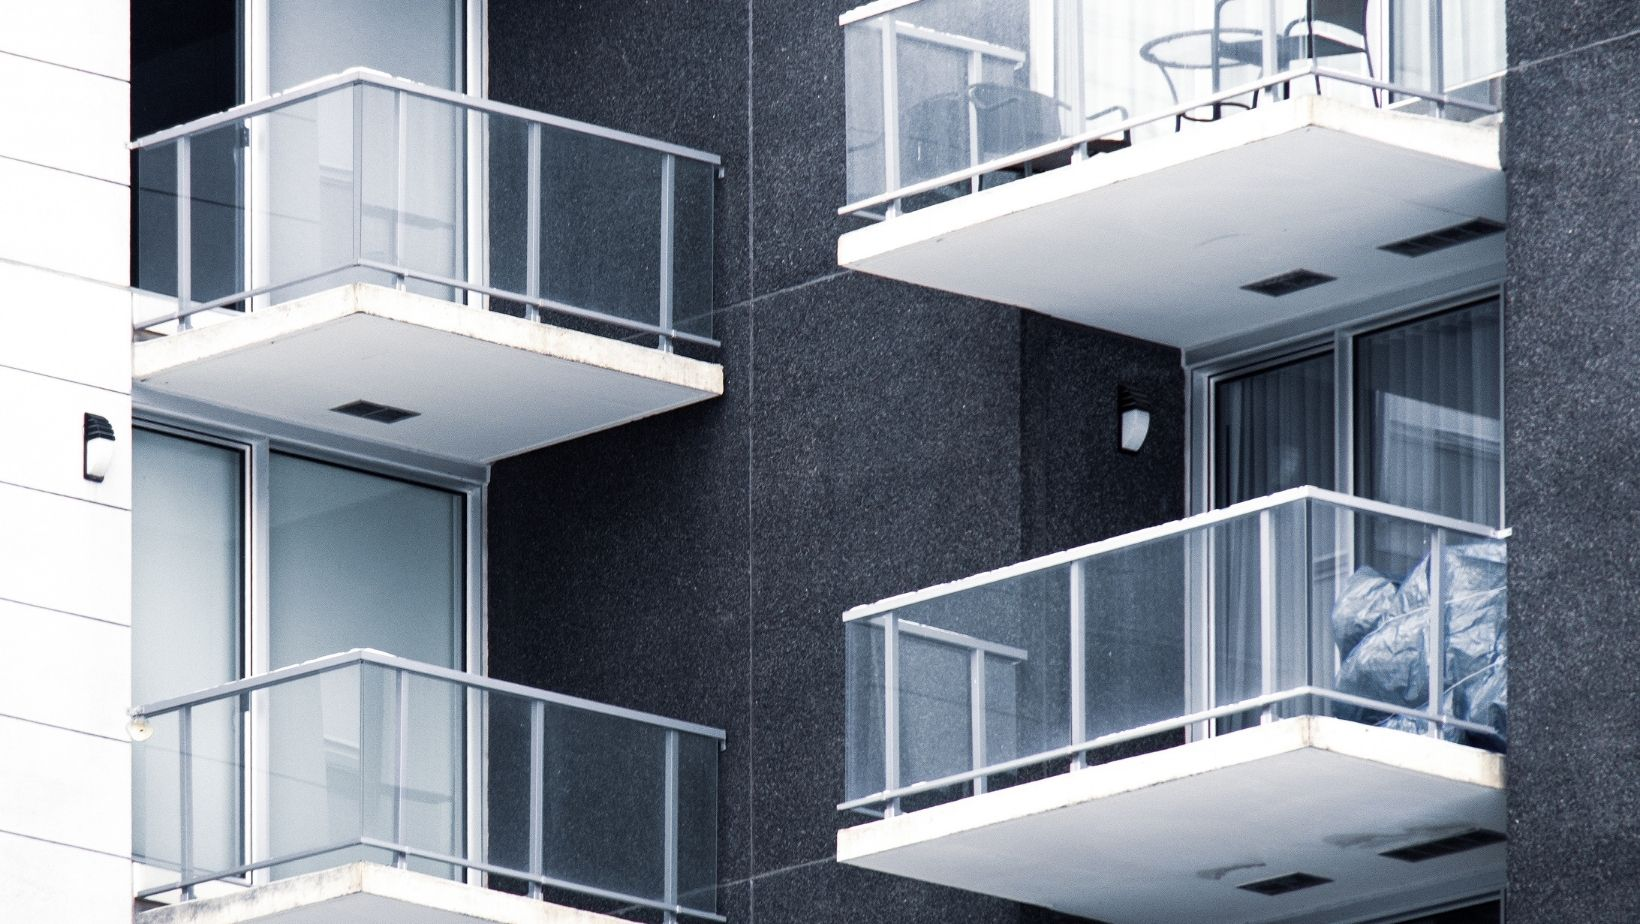 Avantaja si dezavantaje apartament etaj intermediar